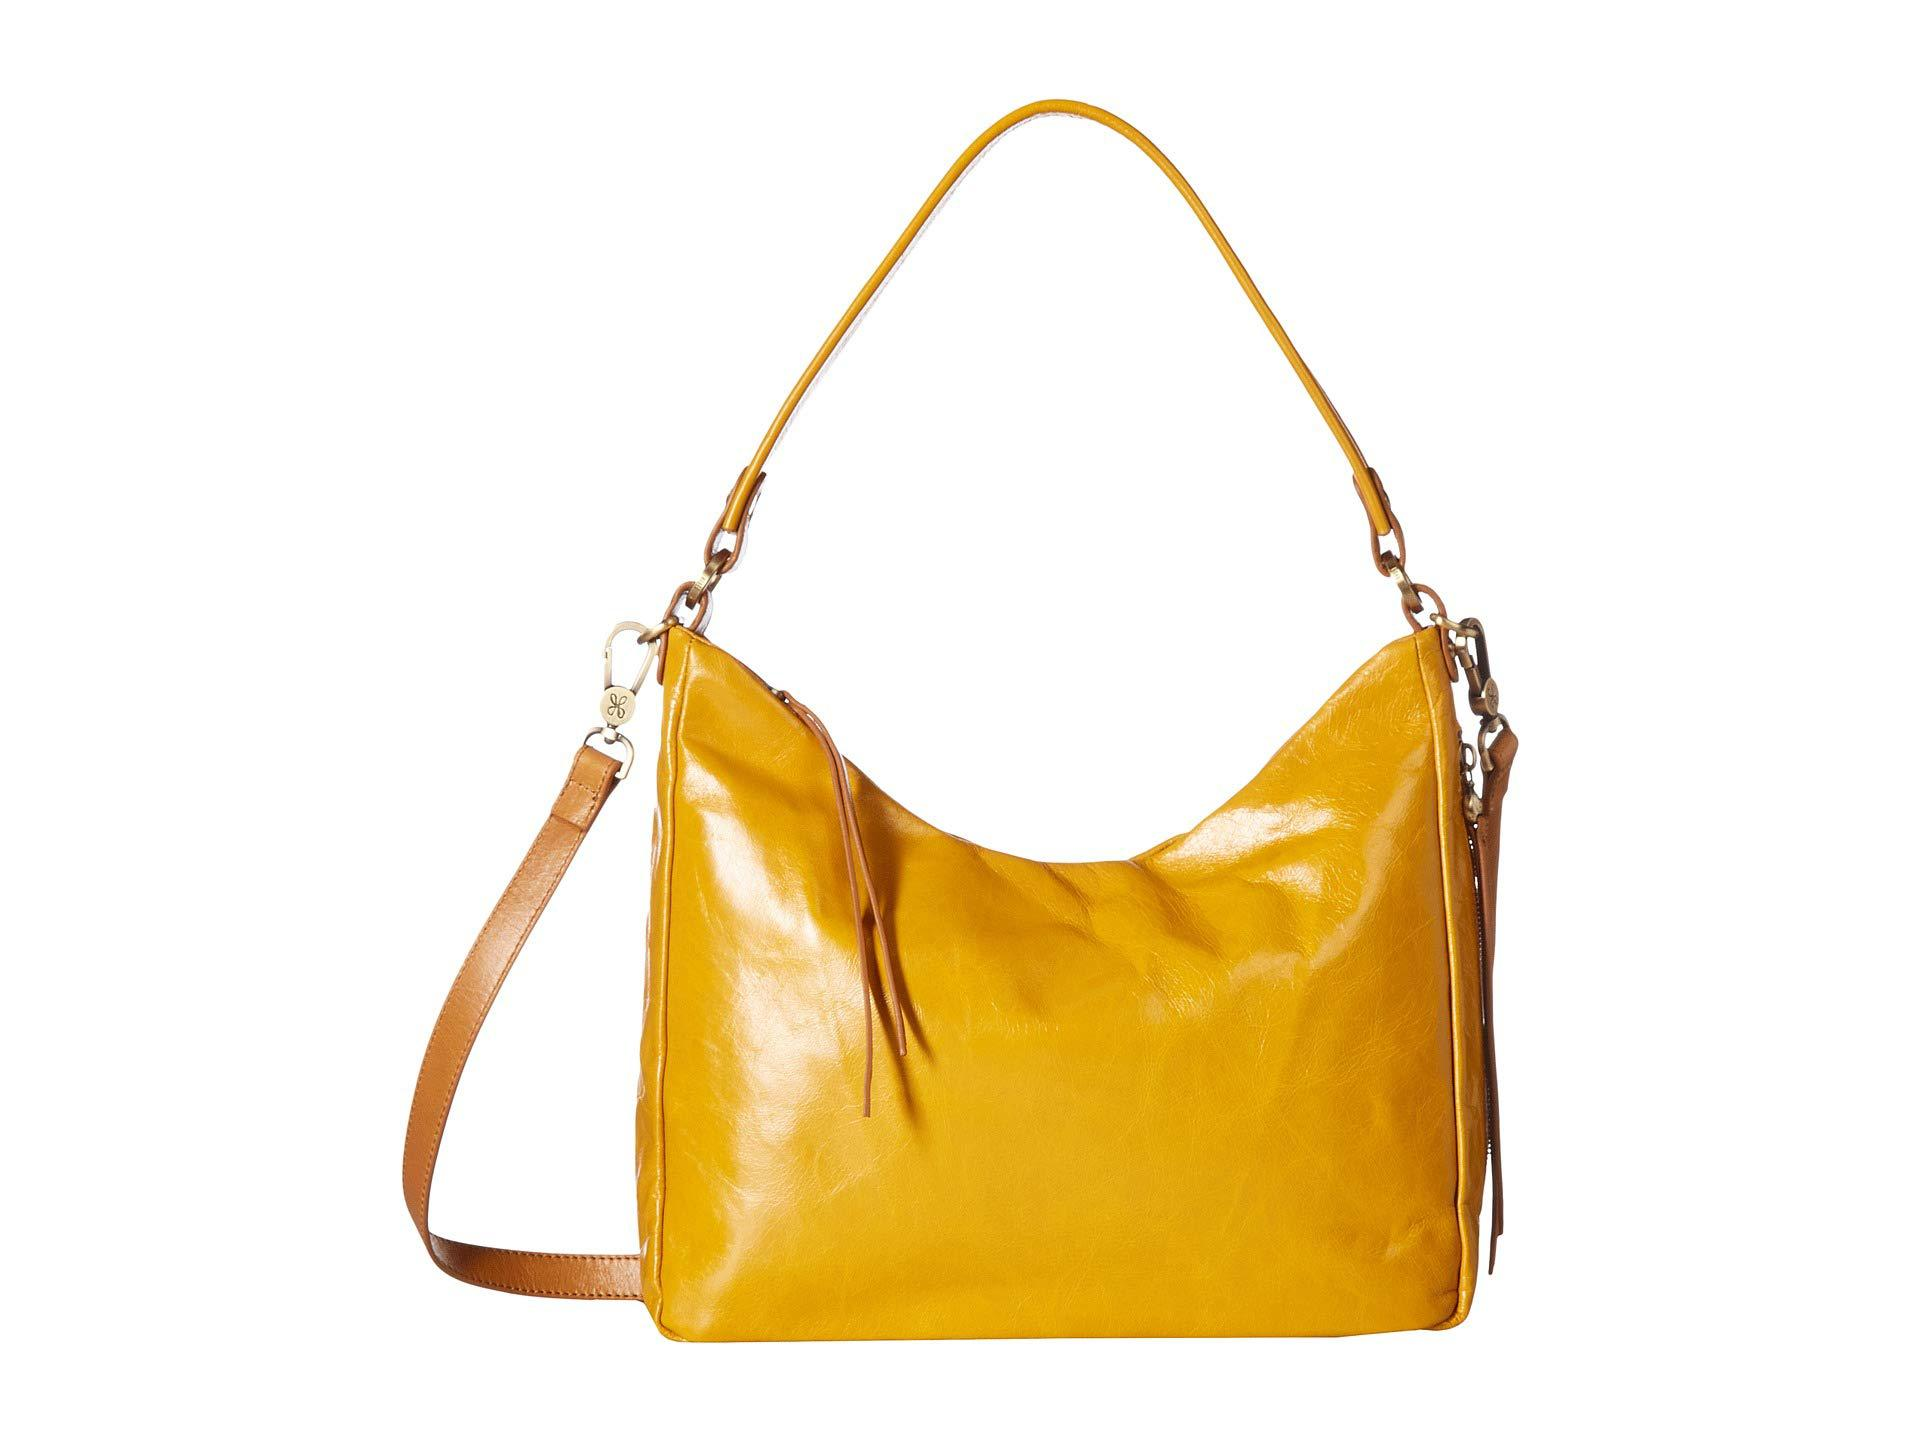 9ef77cb13 Lyst - Hobo Delilah (moss) Handbags in Yellow